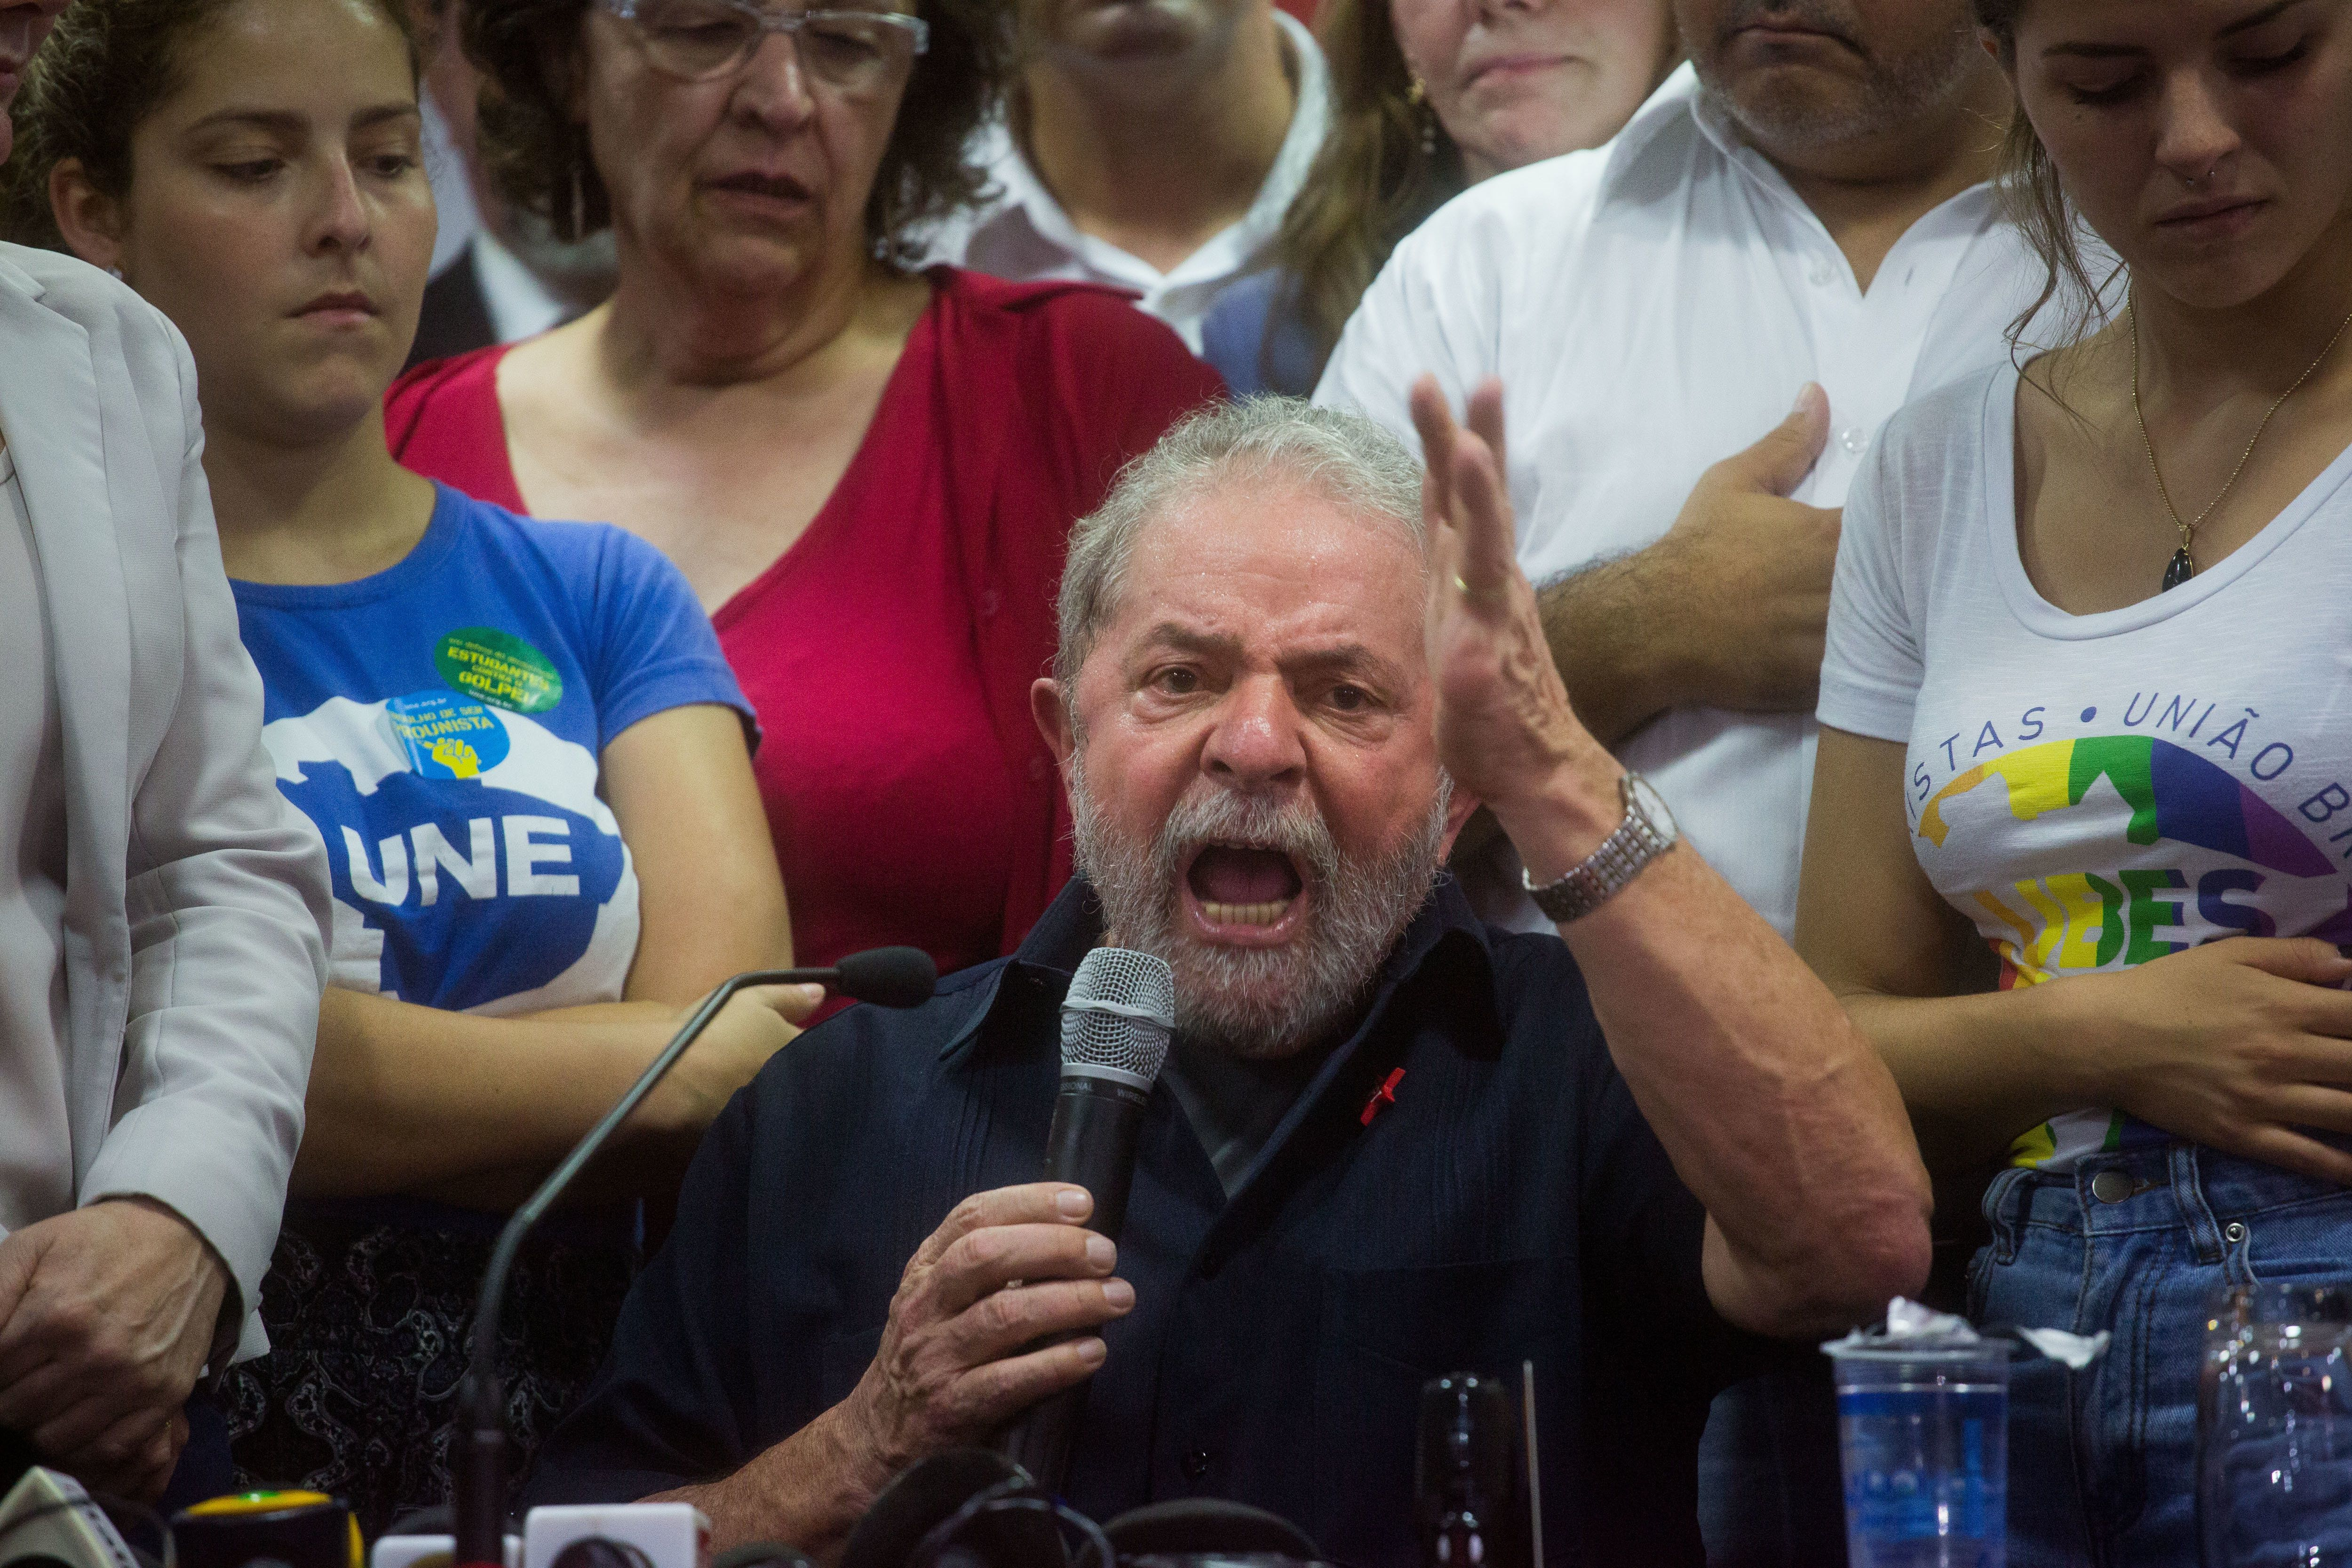 Former Brazilian President Lula Defies Prison Order, Creating Standoff